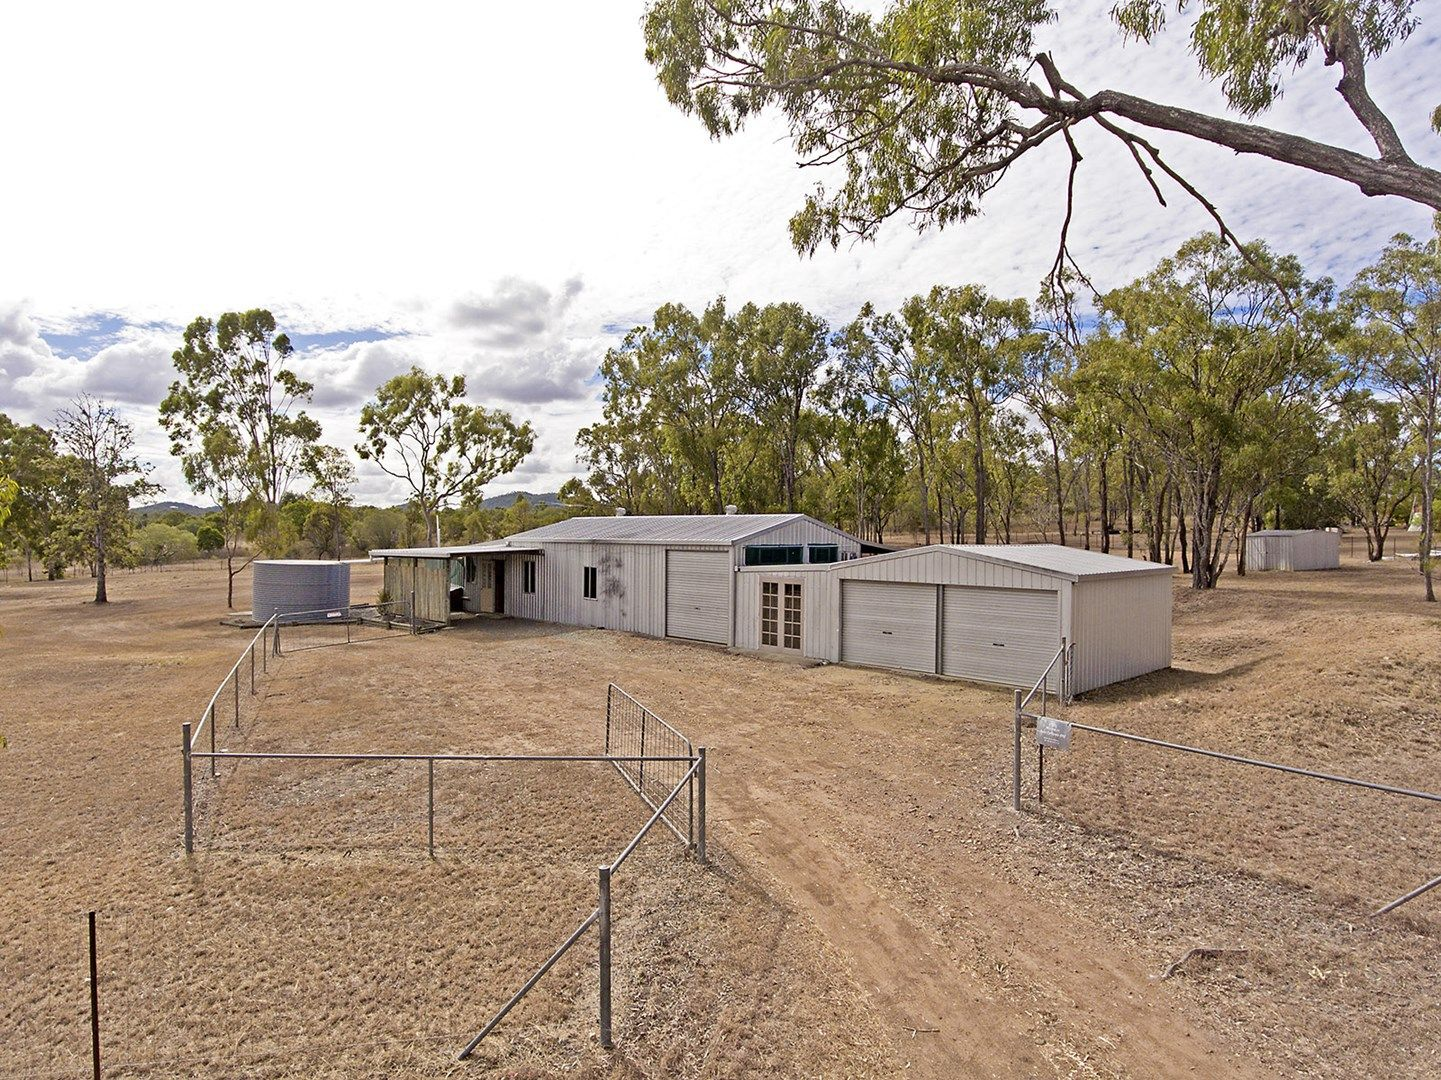 39 GARN HATCH LANE, Etna Creek QLD 4702, Image 2